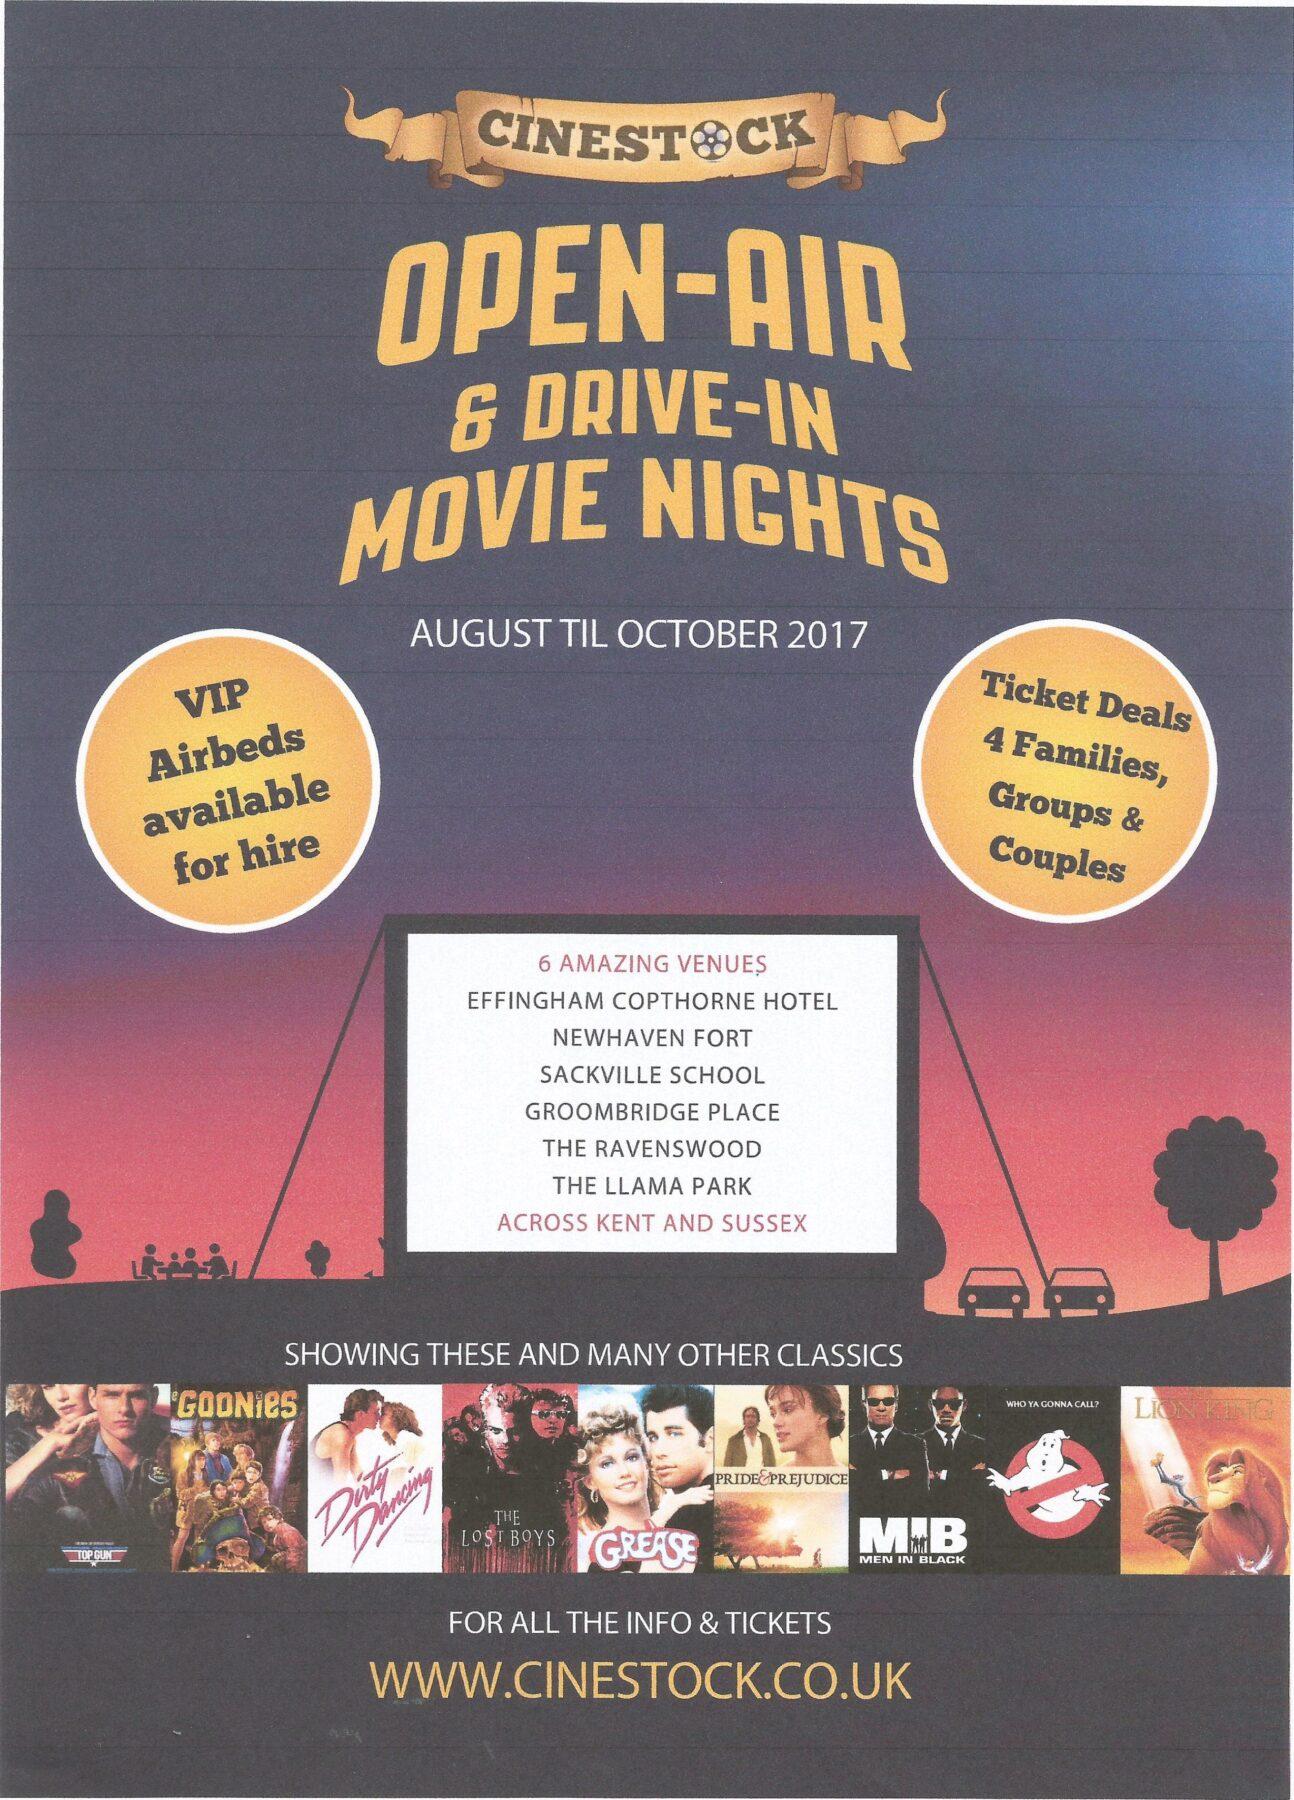 Cinestock Open-Air & Drive-in Movie Nights